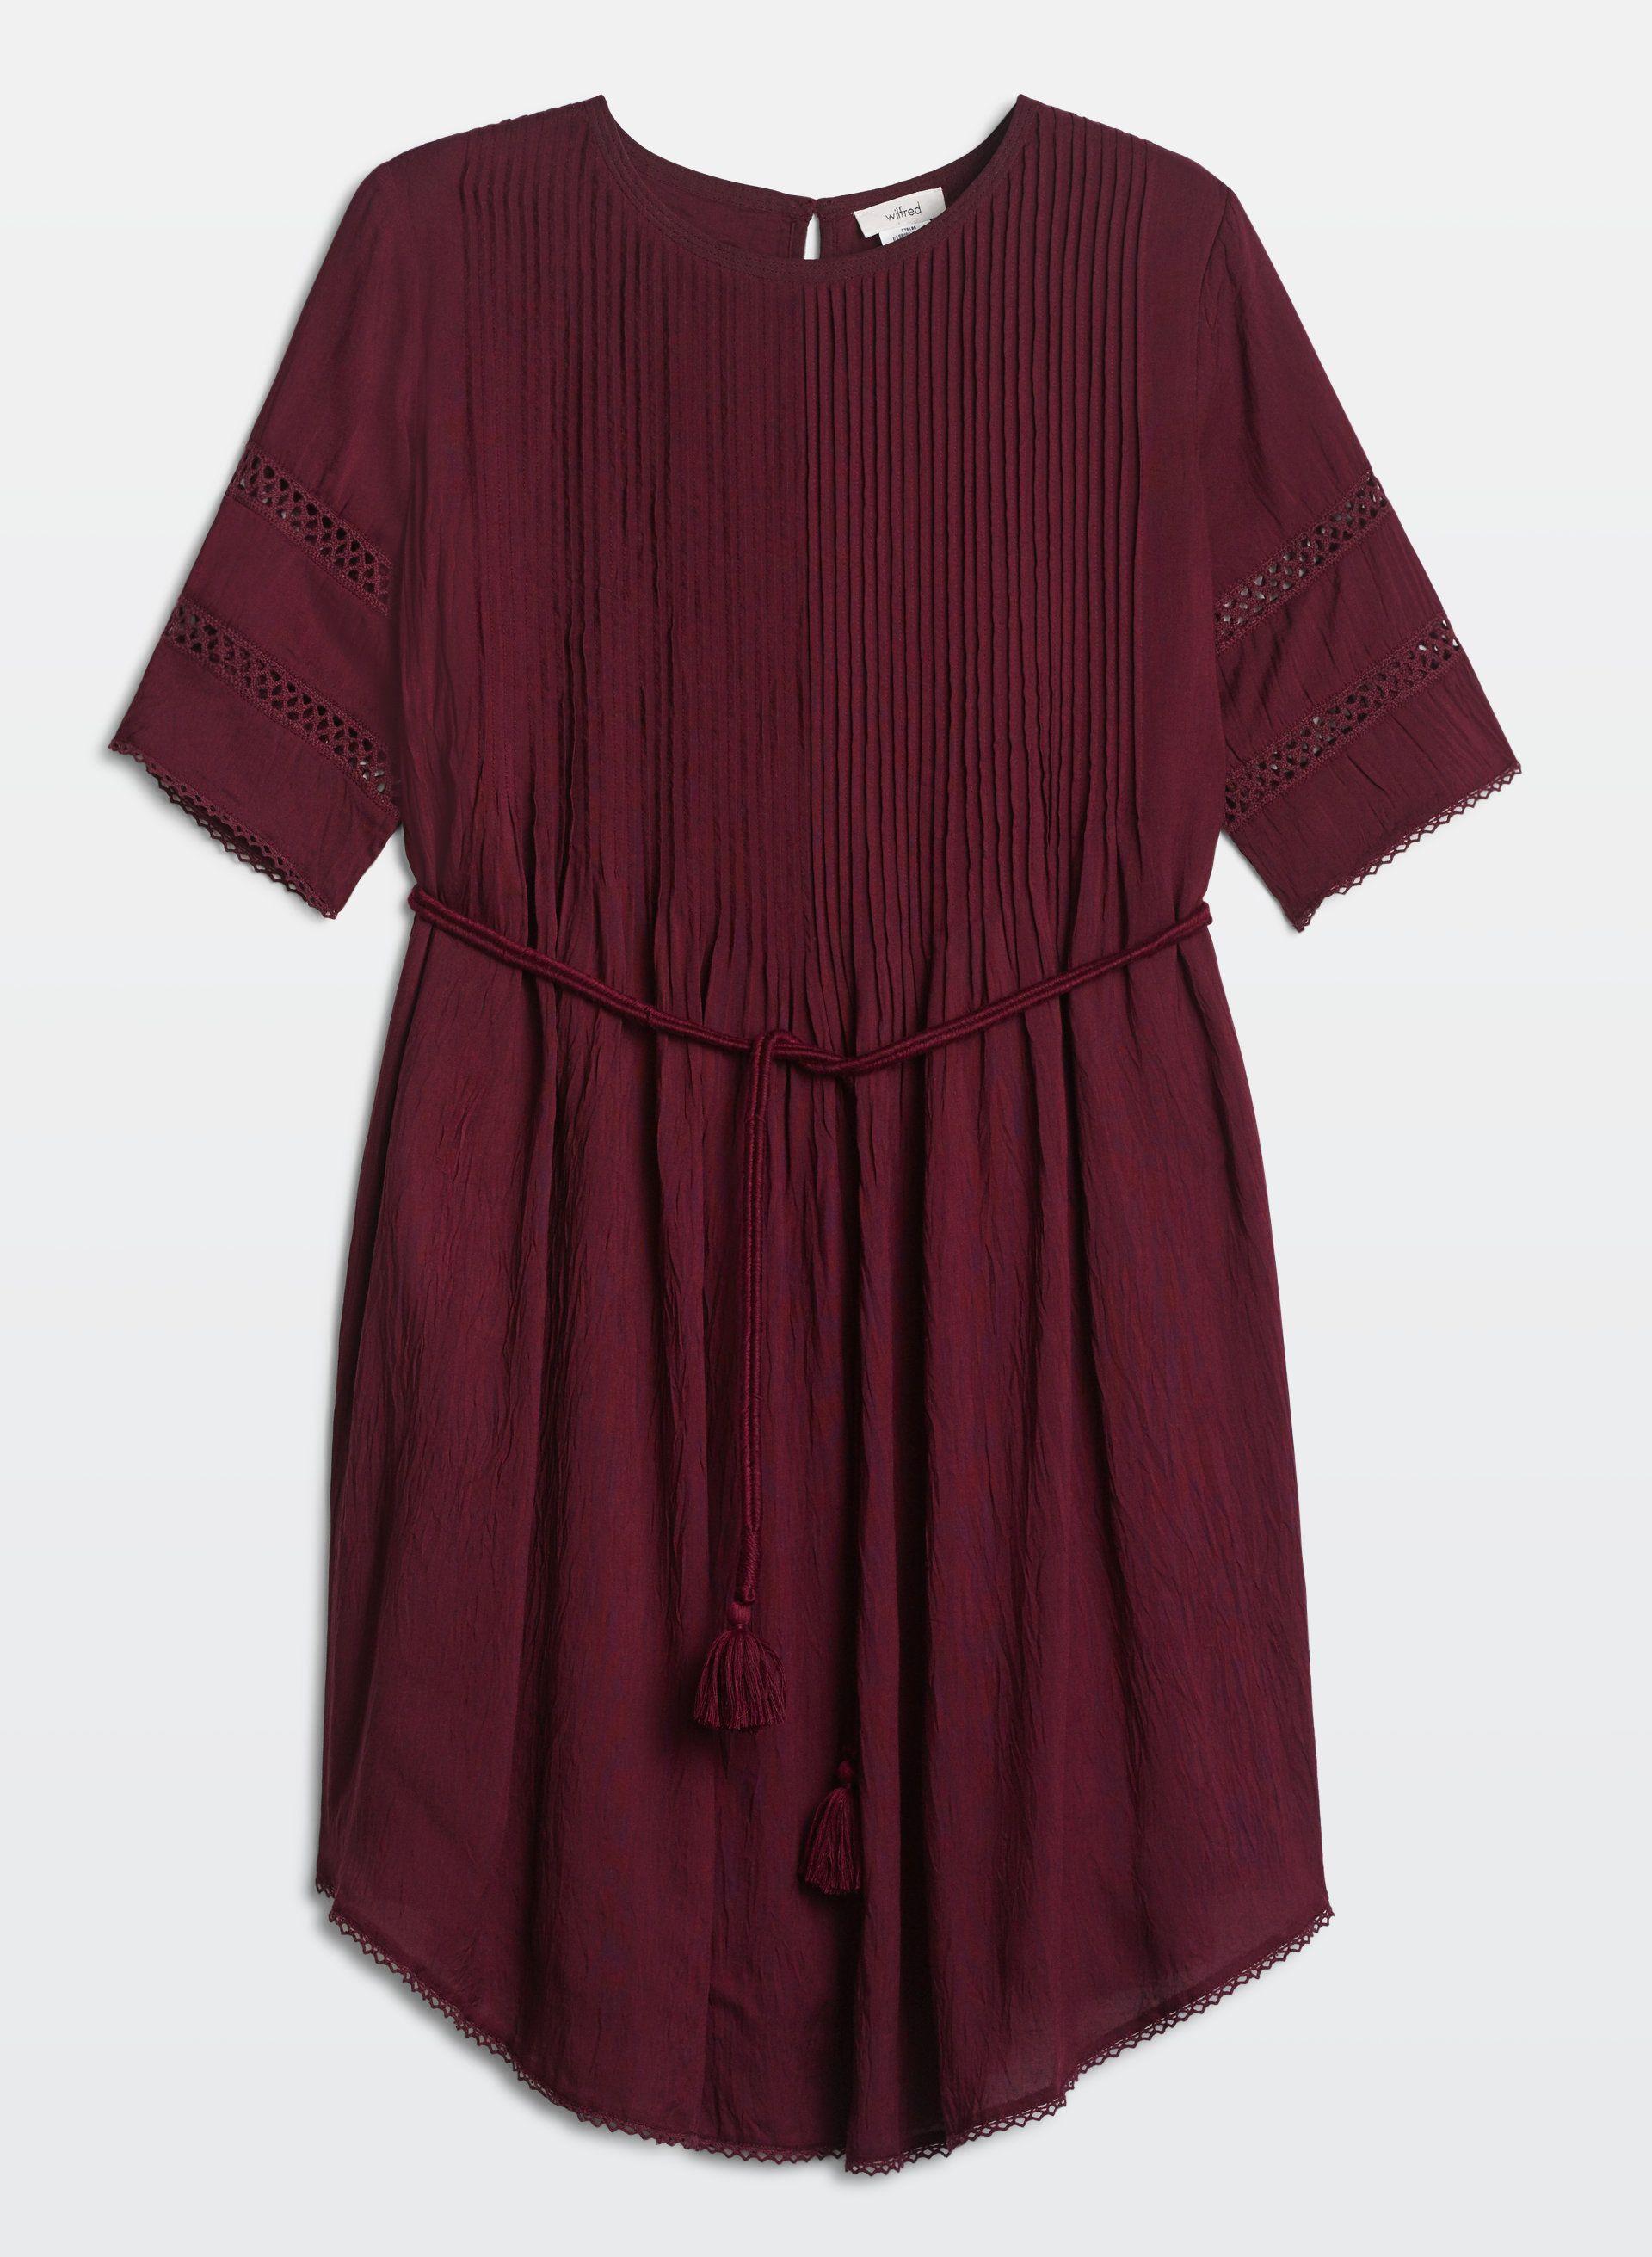 ea035ba07ee1 Wilfred SONORE DRESS